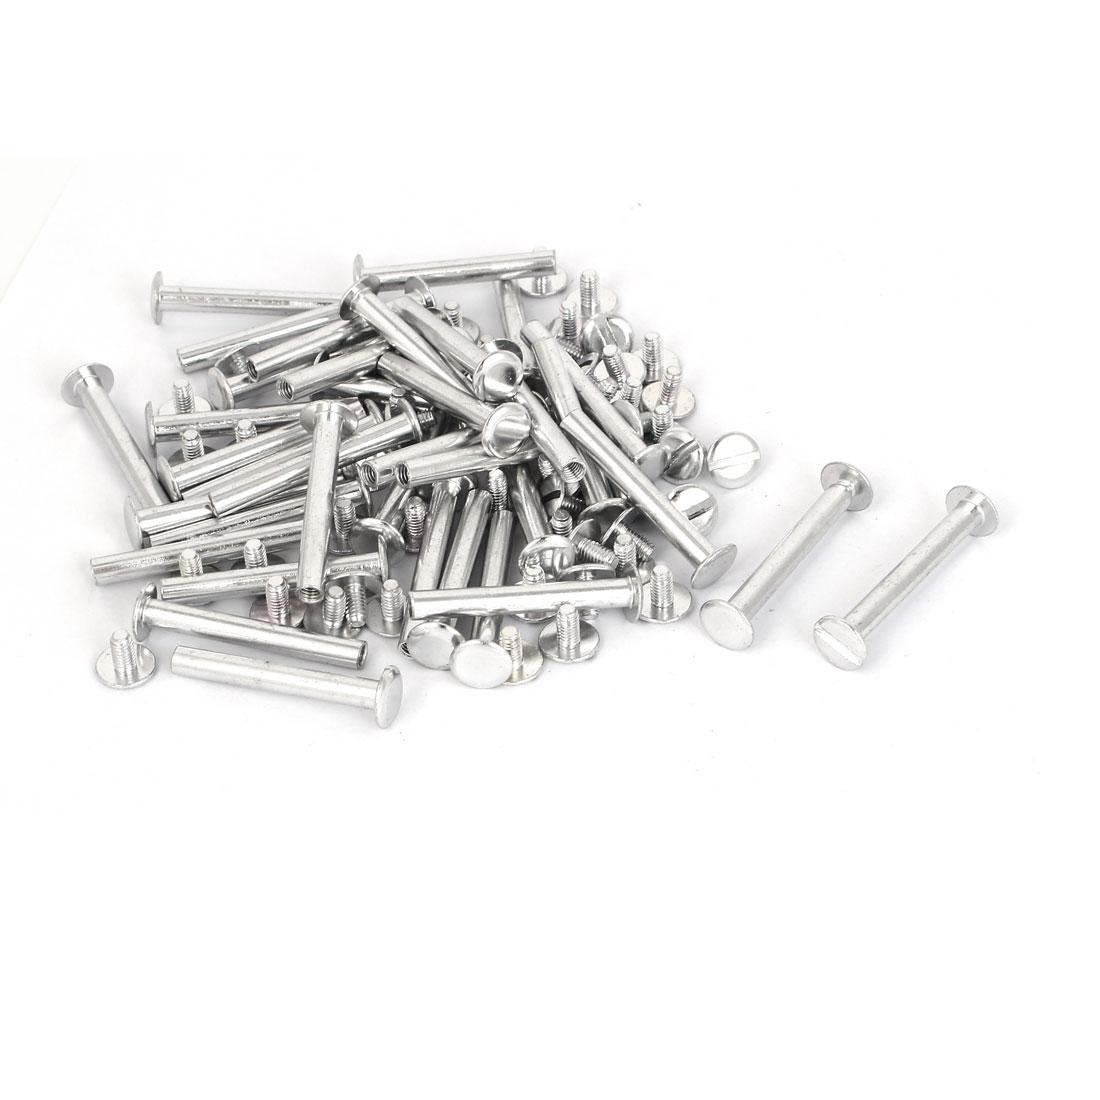 M5x38mm Aluminum Chicago Screws Binding Posts Silver Tone 50pcs